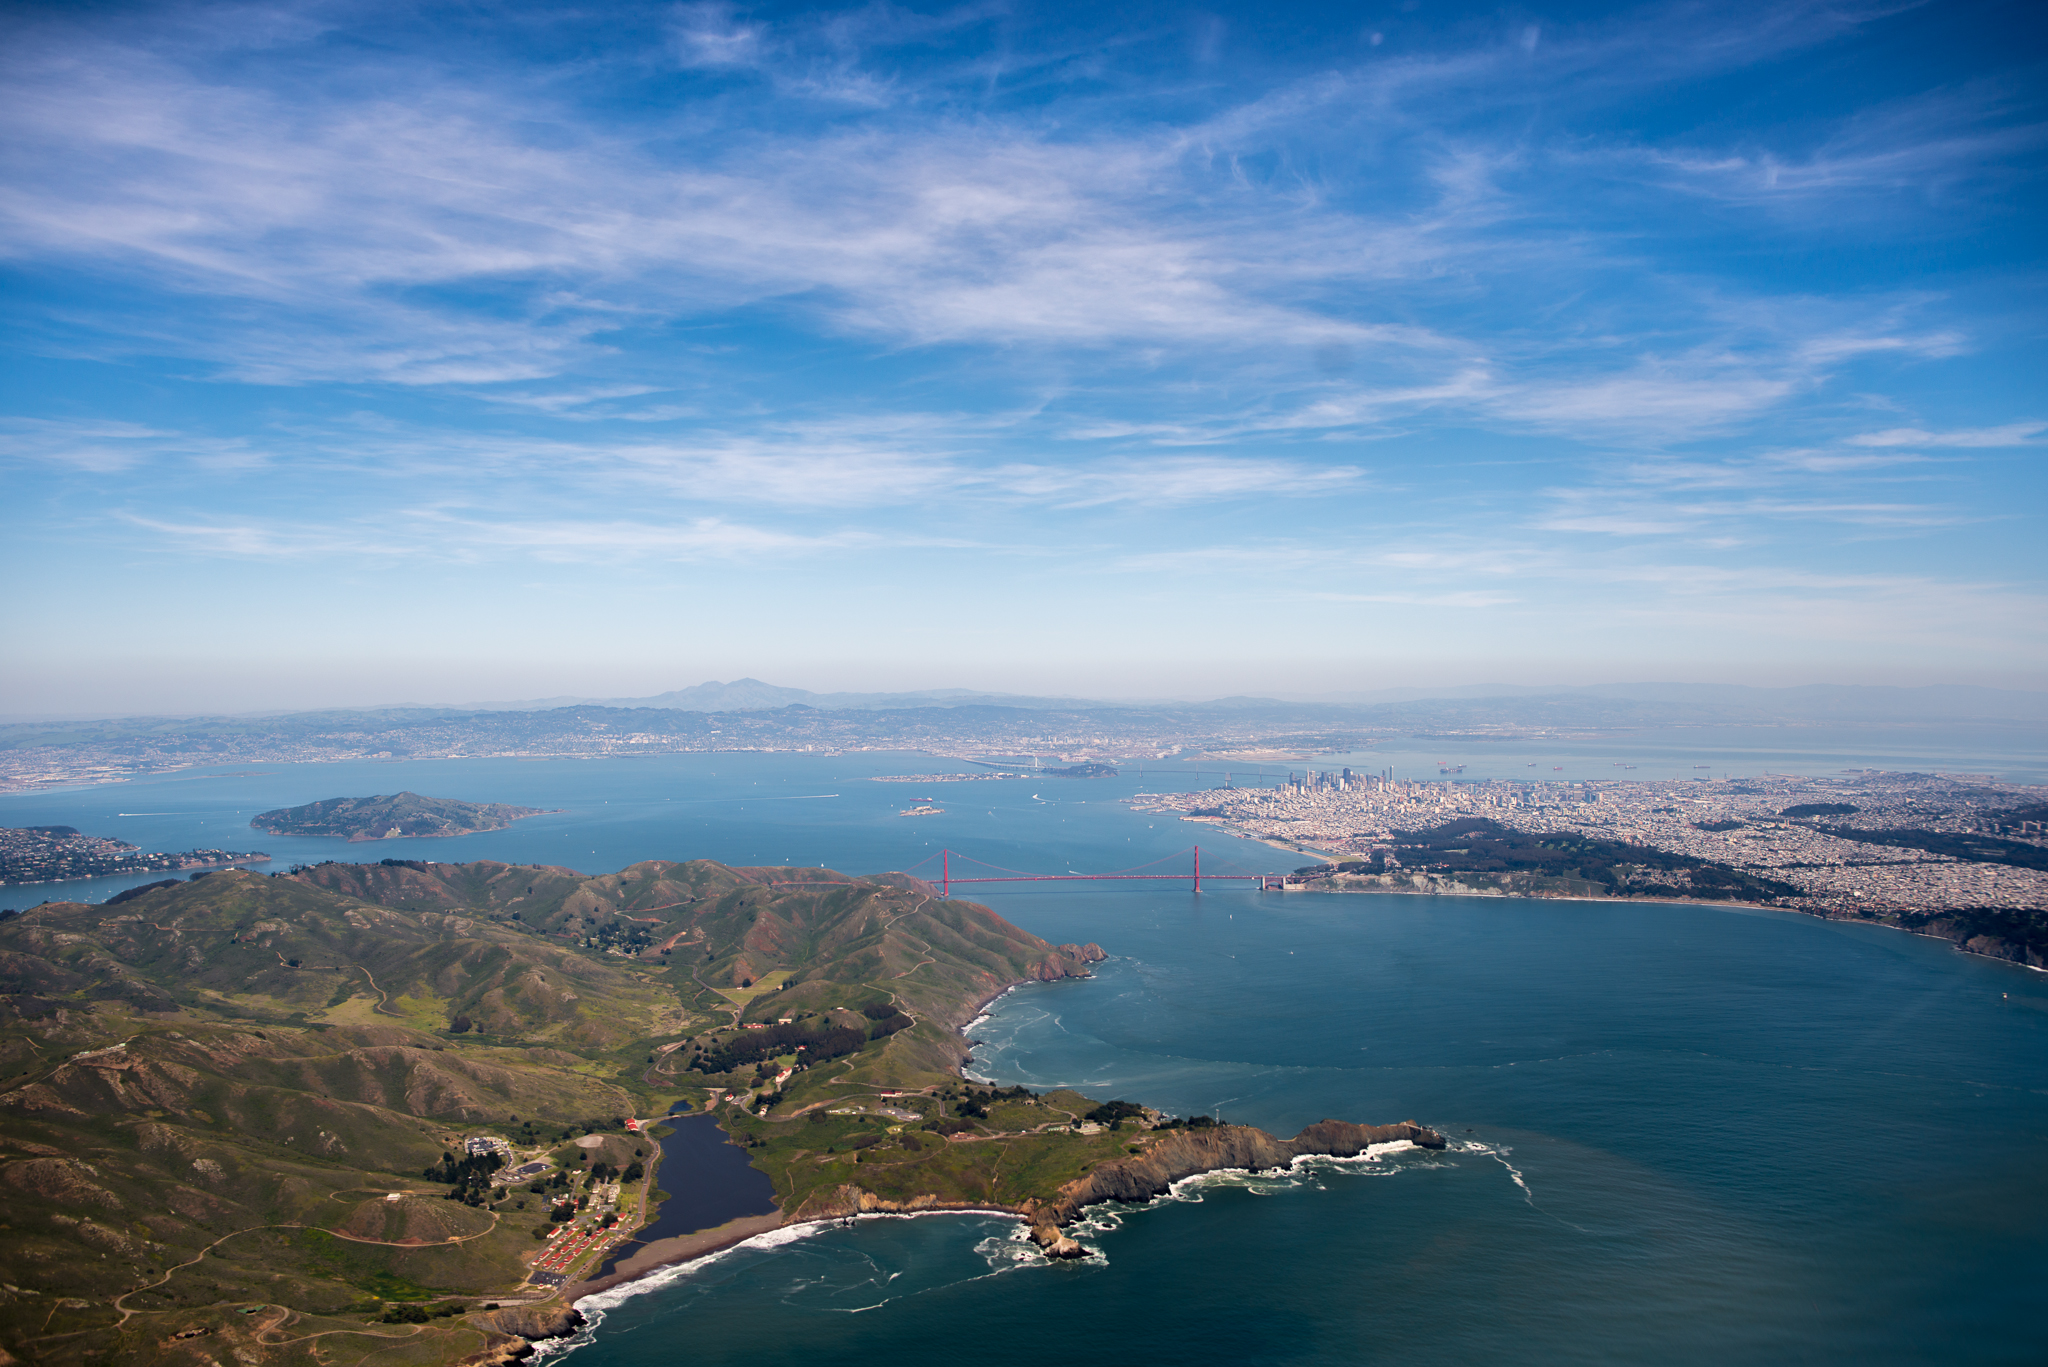 San Francisco Bay Area with the Golden Gate Bridge